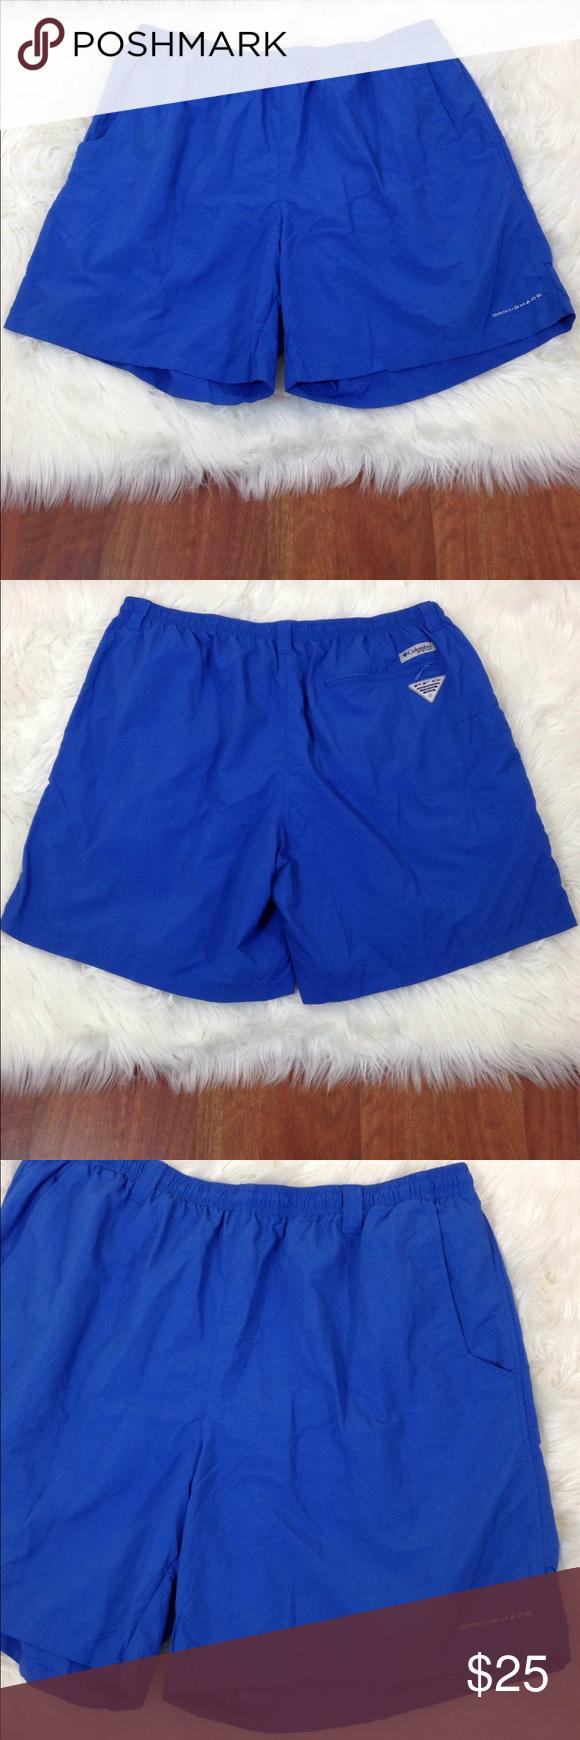 Columbia Men S Swim Trunks Board Shorts Blue Xxl In 2020 Mens Swim Trunks Swim Trunks Gym Shorts Womens